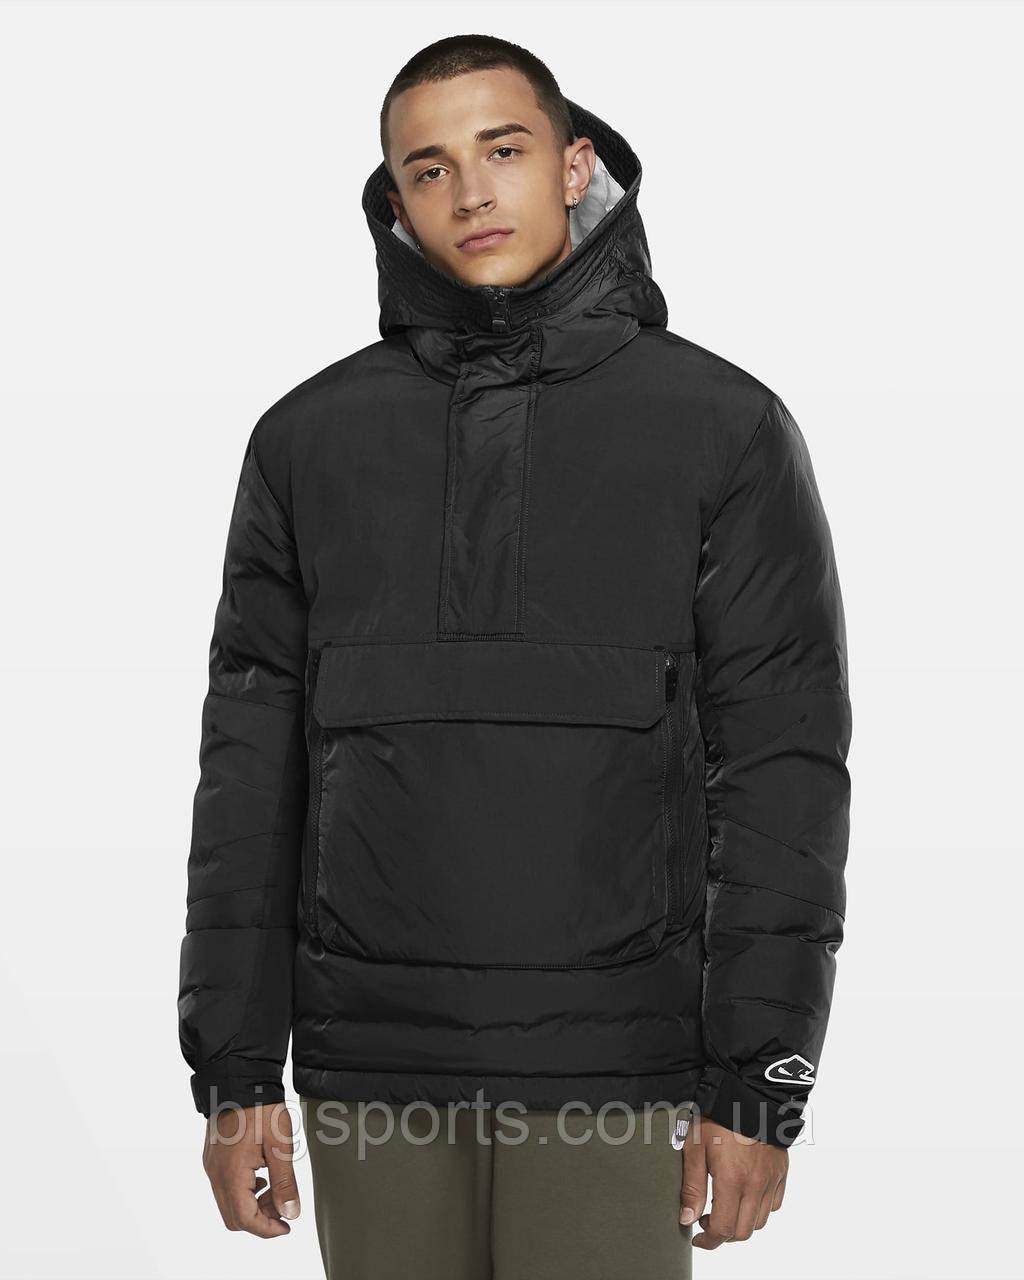 Куртка муж. Nike Sportswear Synthetic-Fill Men's Repel Anorak (арт. CU4420-010)